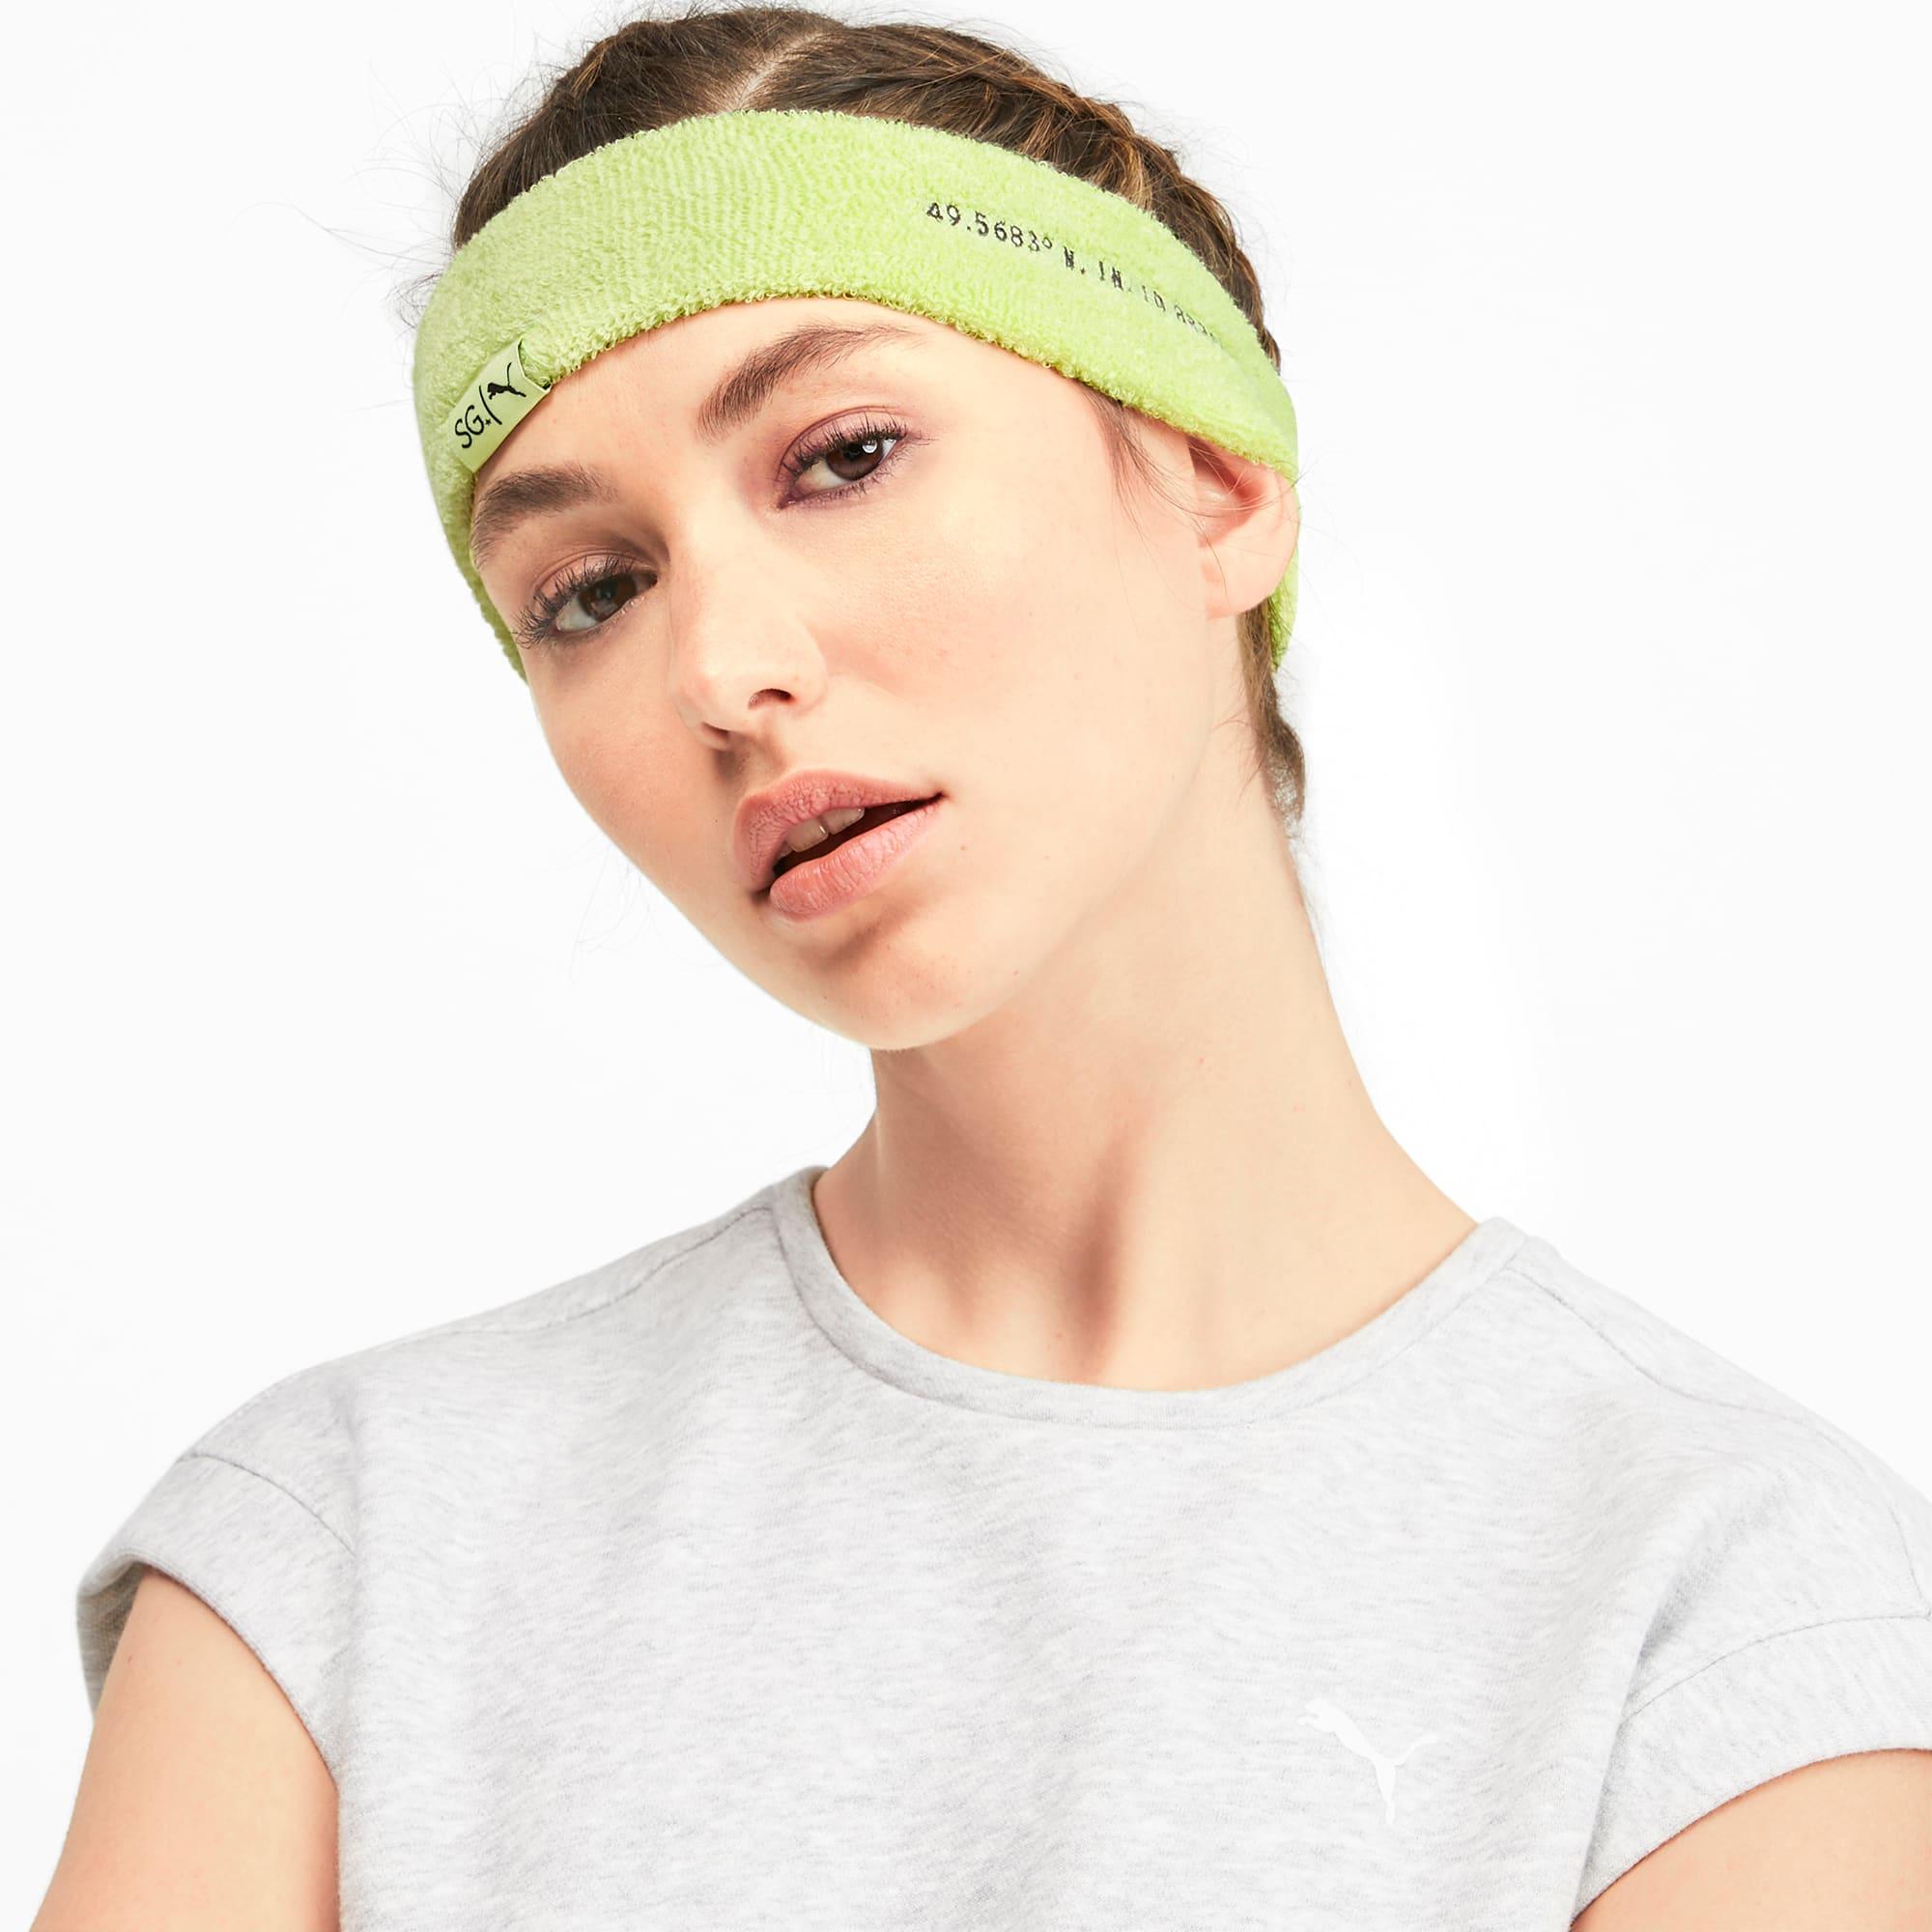 SG x PUMA Headband